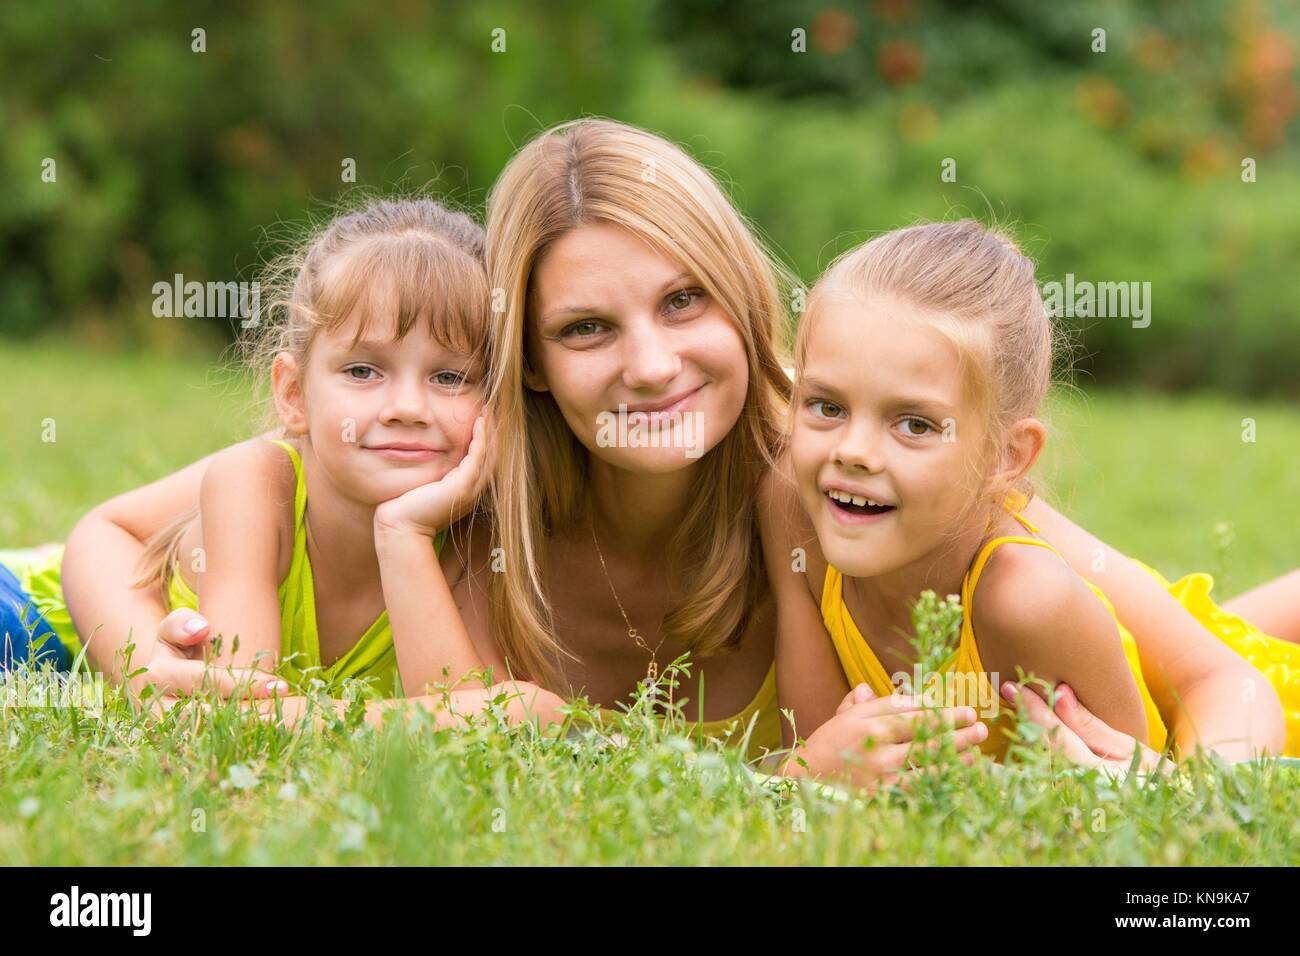 Mother Daughter Lie On Grass Stockfotos & Mother Daughter Lie On ...